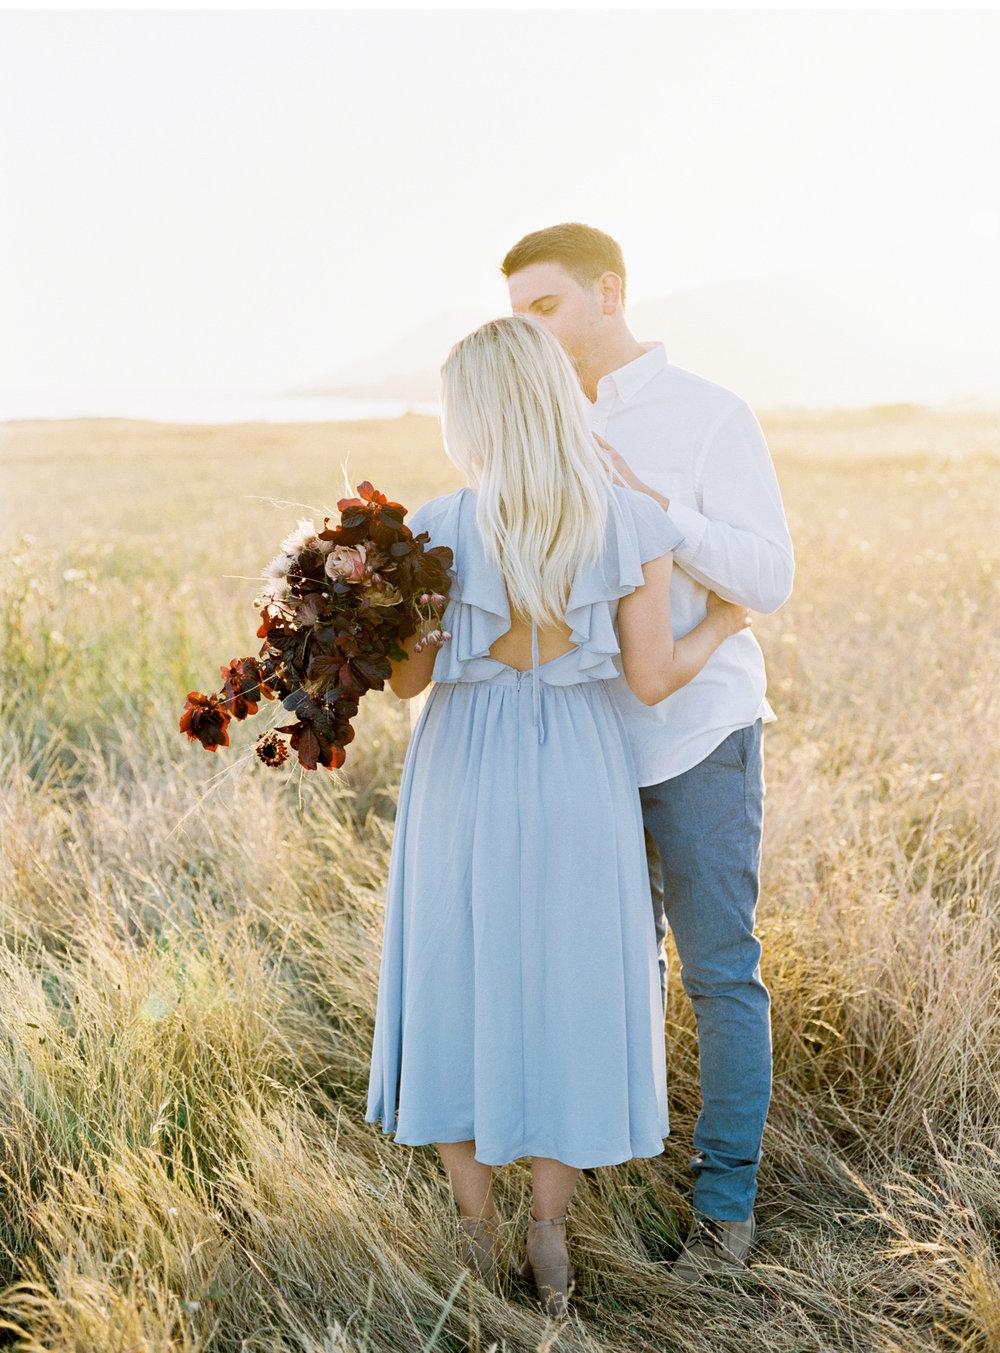 Malibu-Wedding-Photographer-Natalie-Schutt-Photography_10.jpg